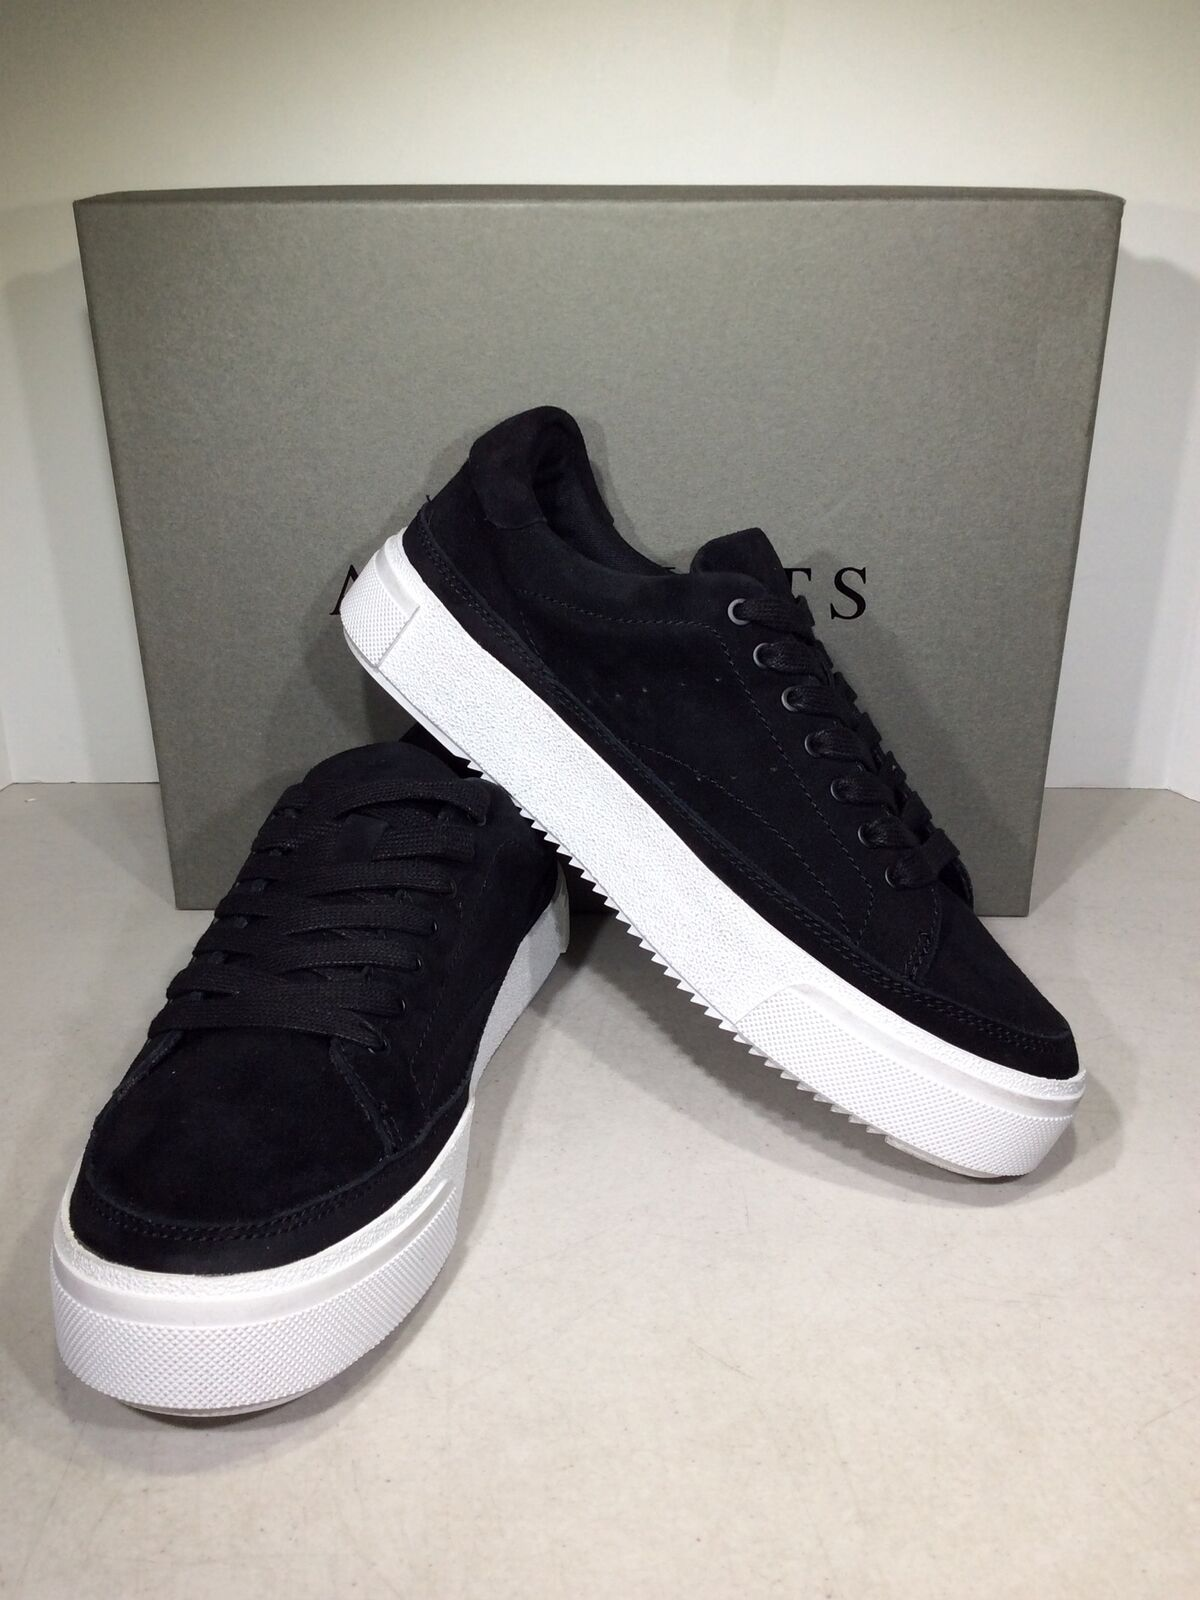 AllSaints Trish Women's Size 6/EU 37 Black Suede Casual Sneakers X6-942